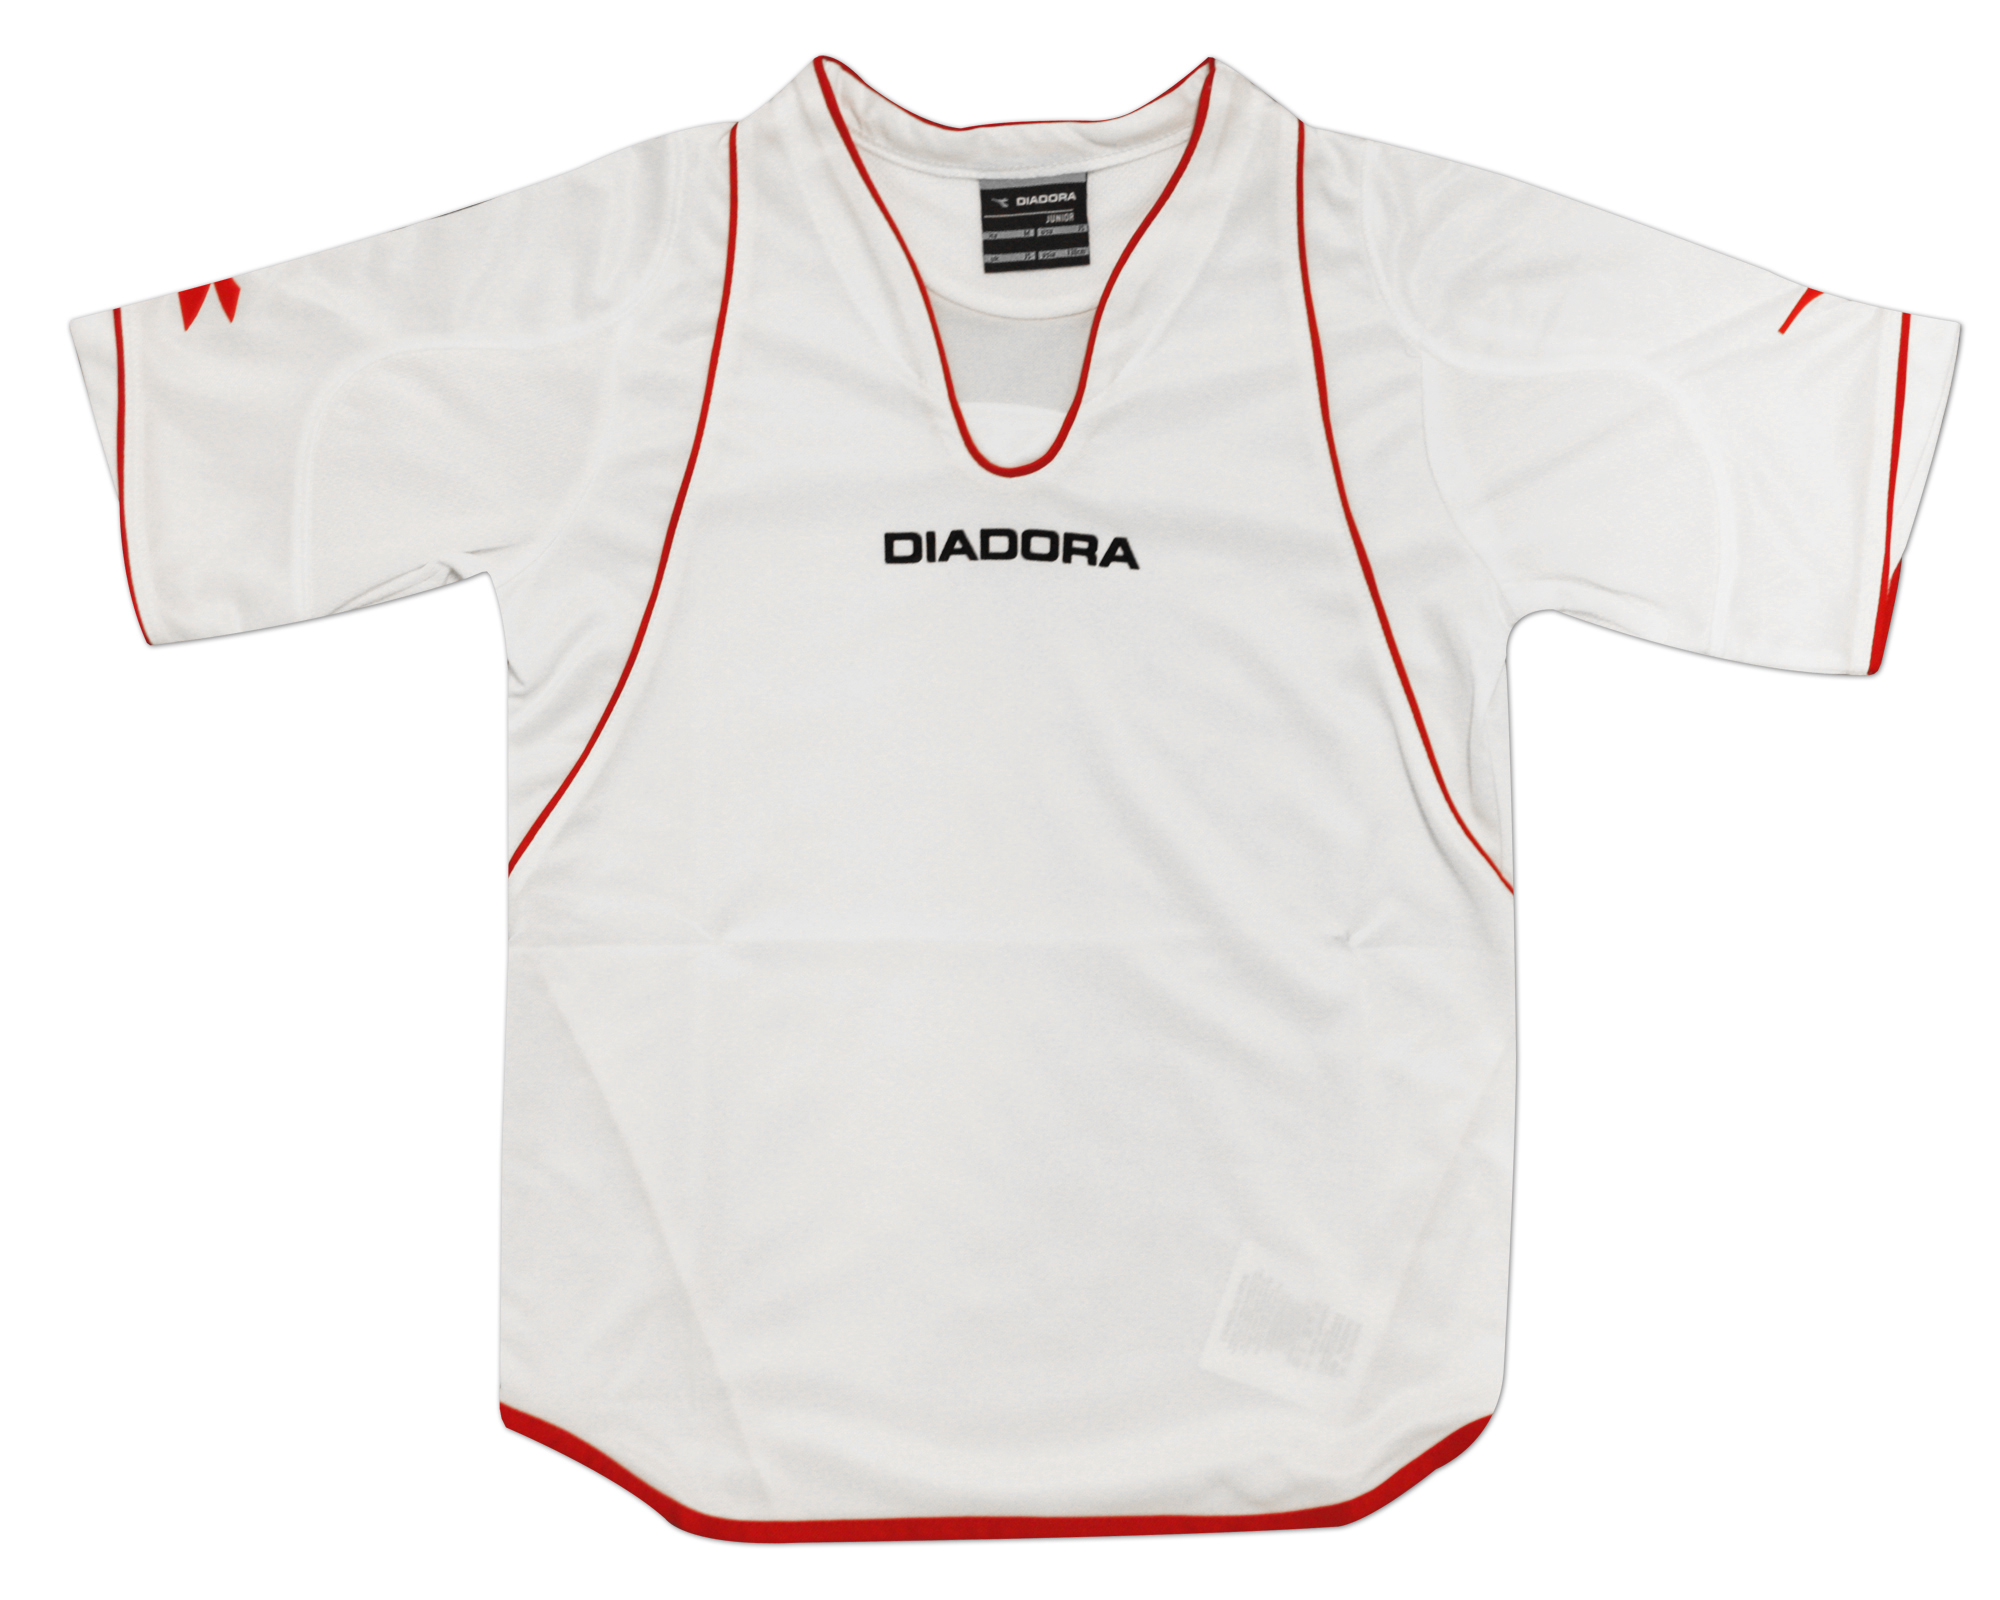 Diadora - Spilletrøje Gammarete Hvid/Rød Børn